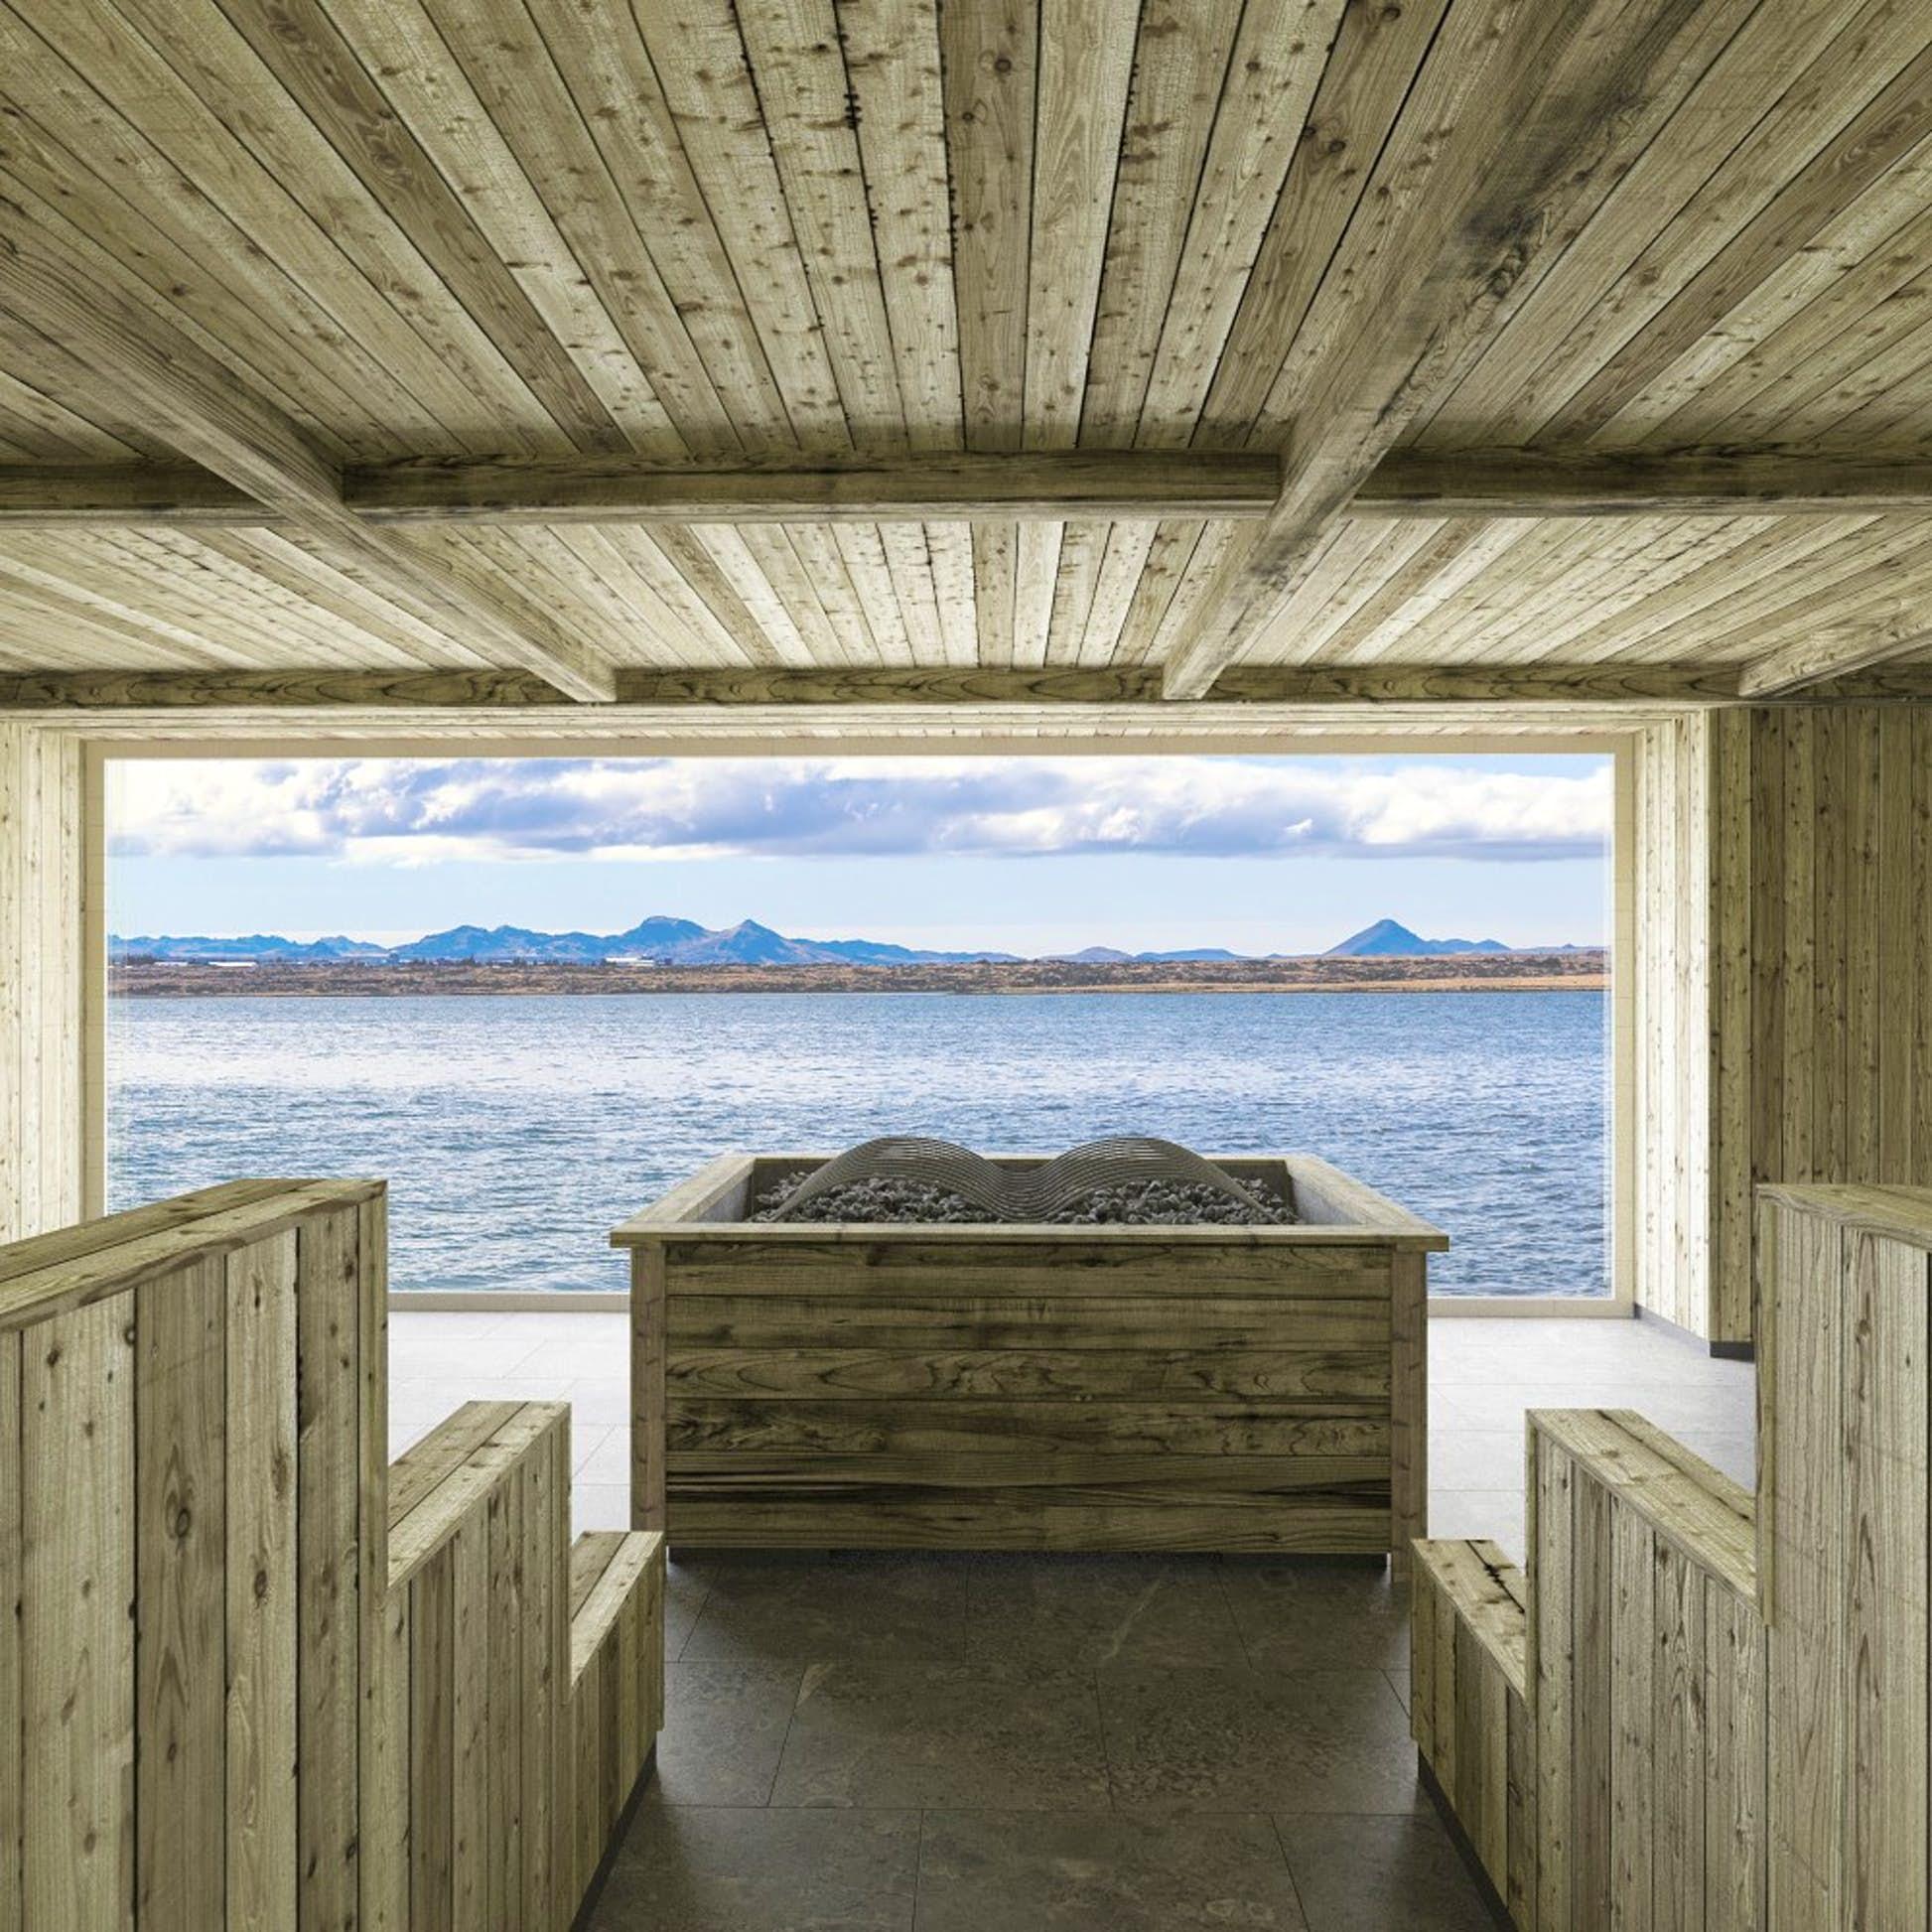 The sauna at Sky Lagoon has amazing views © Pursuit